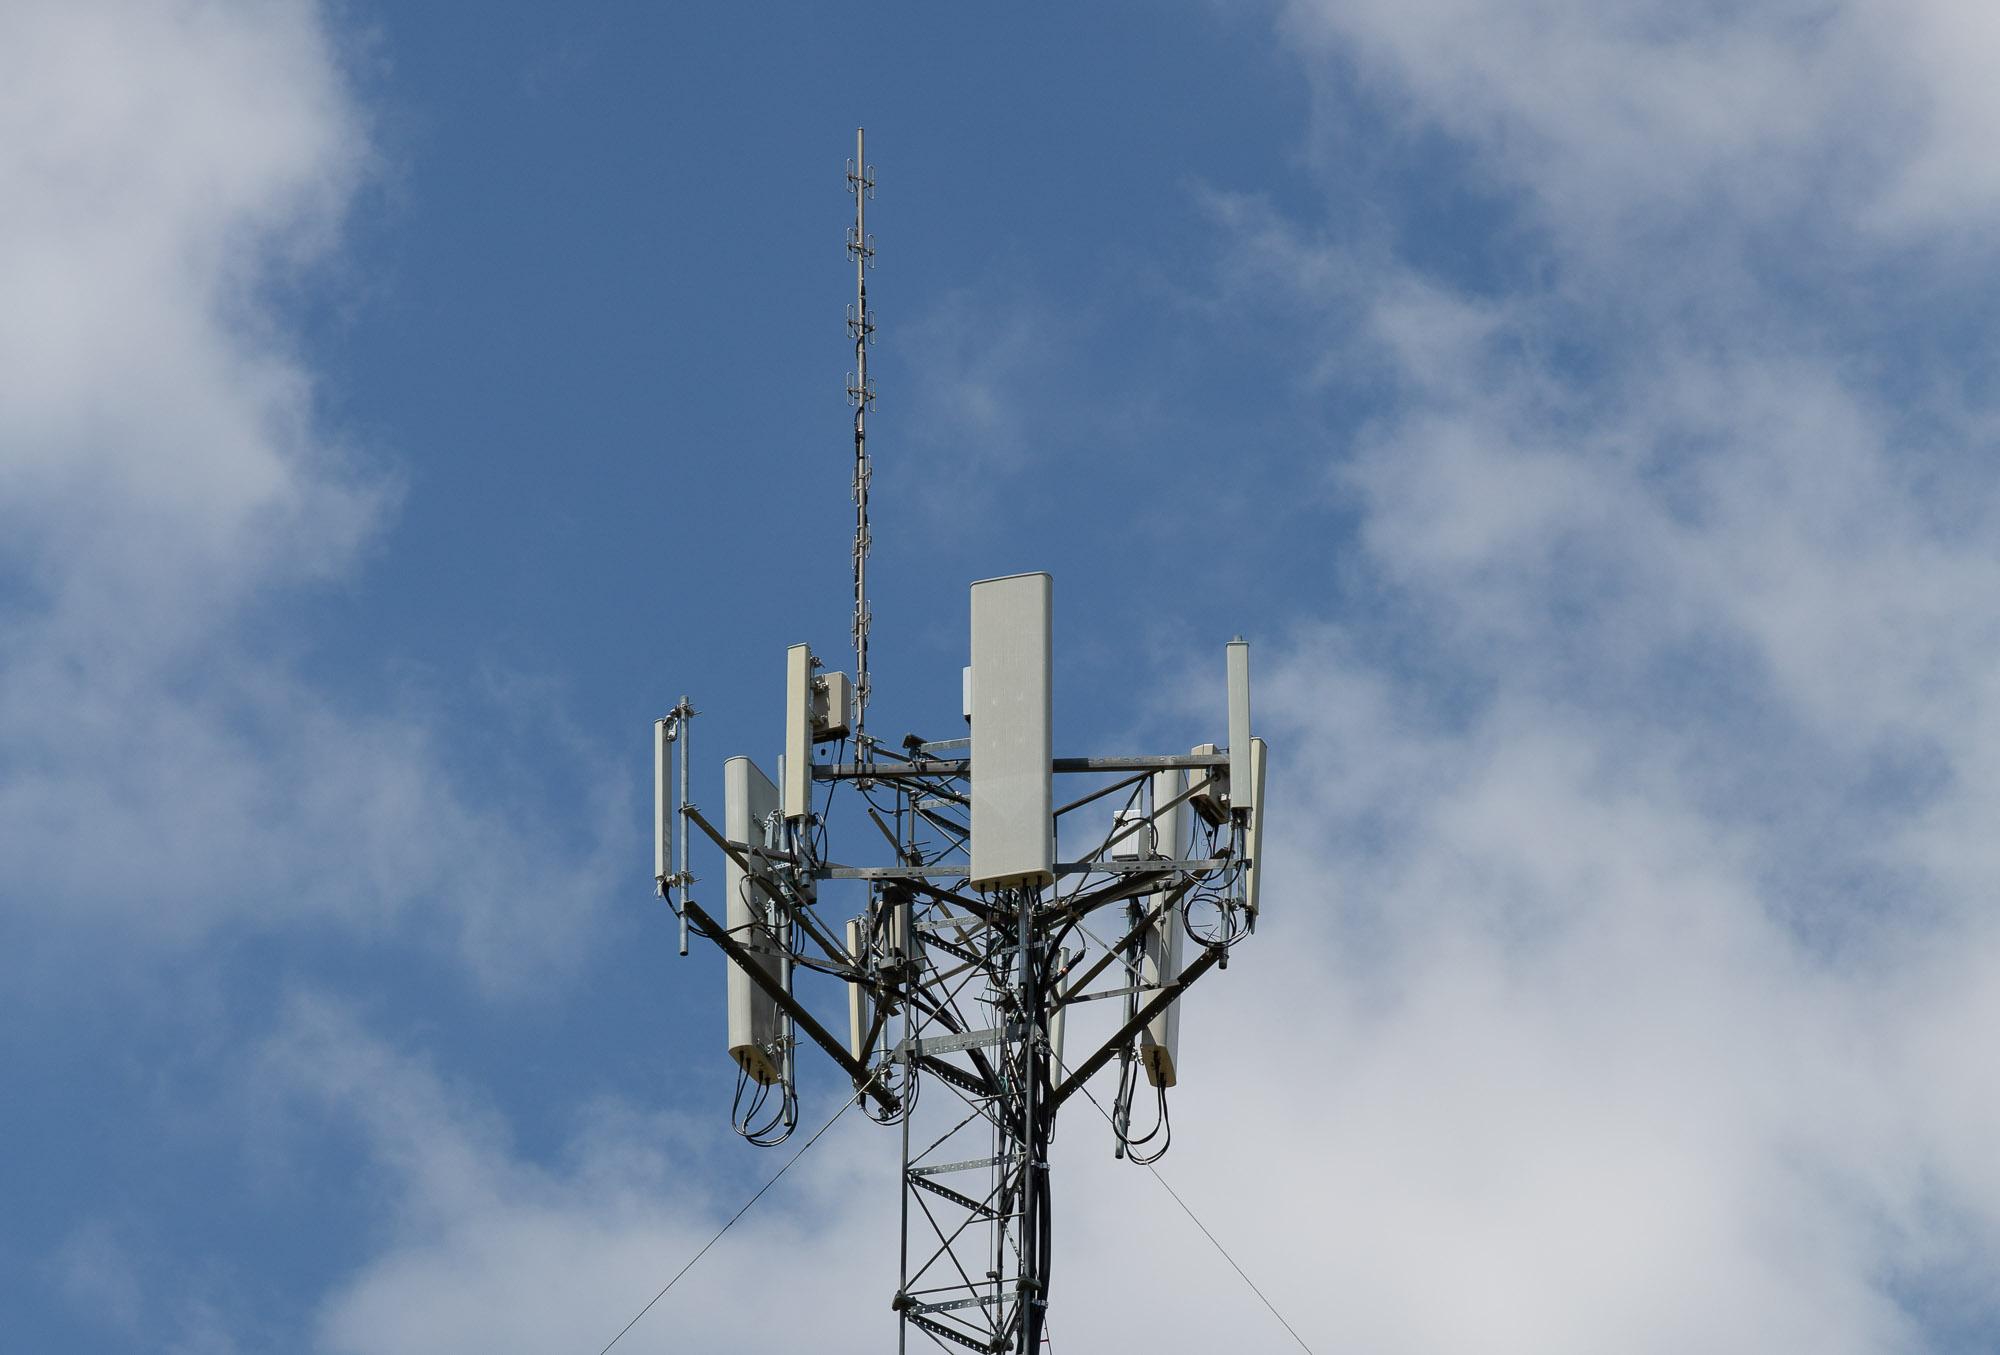 Hutchinson – 444 475 – NV8Q – KS-DMR Network